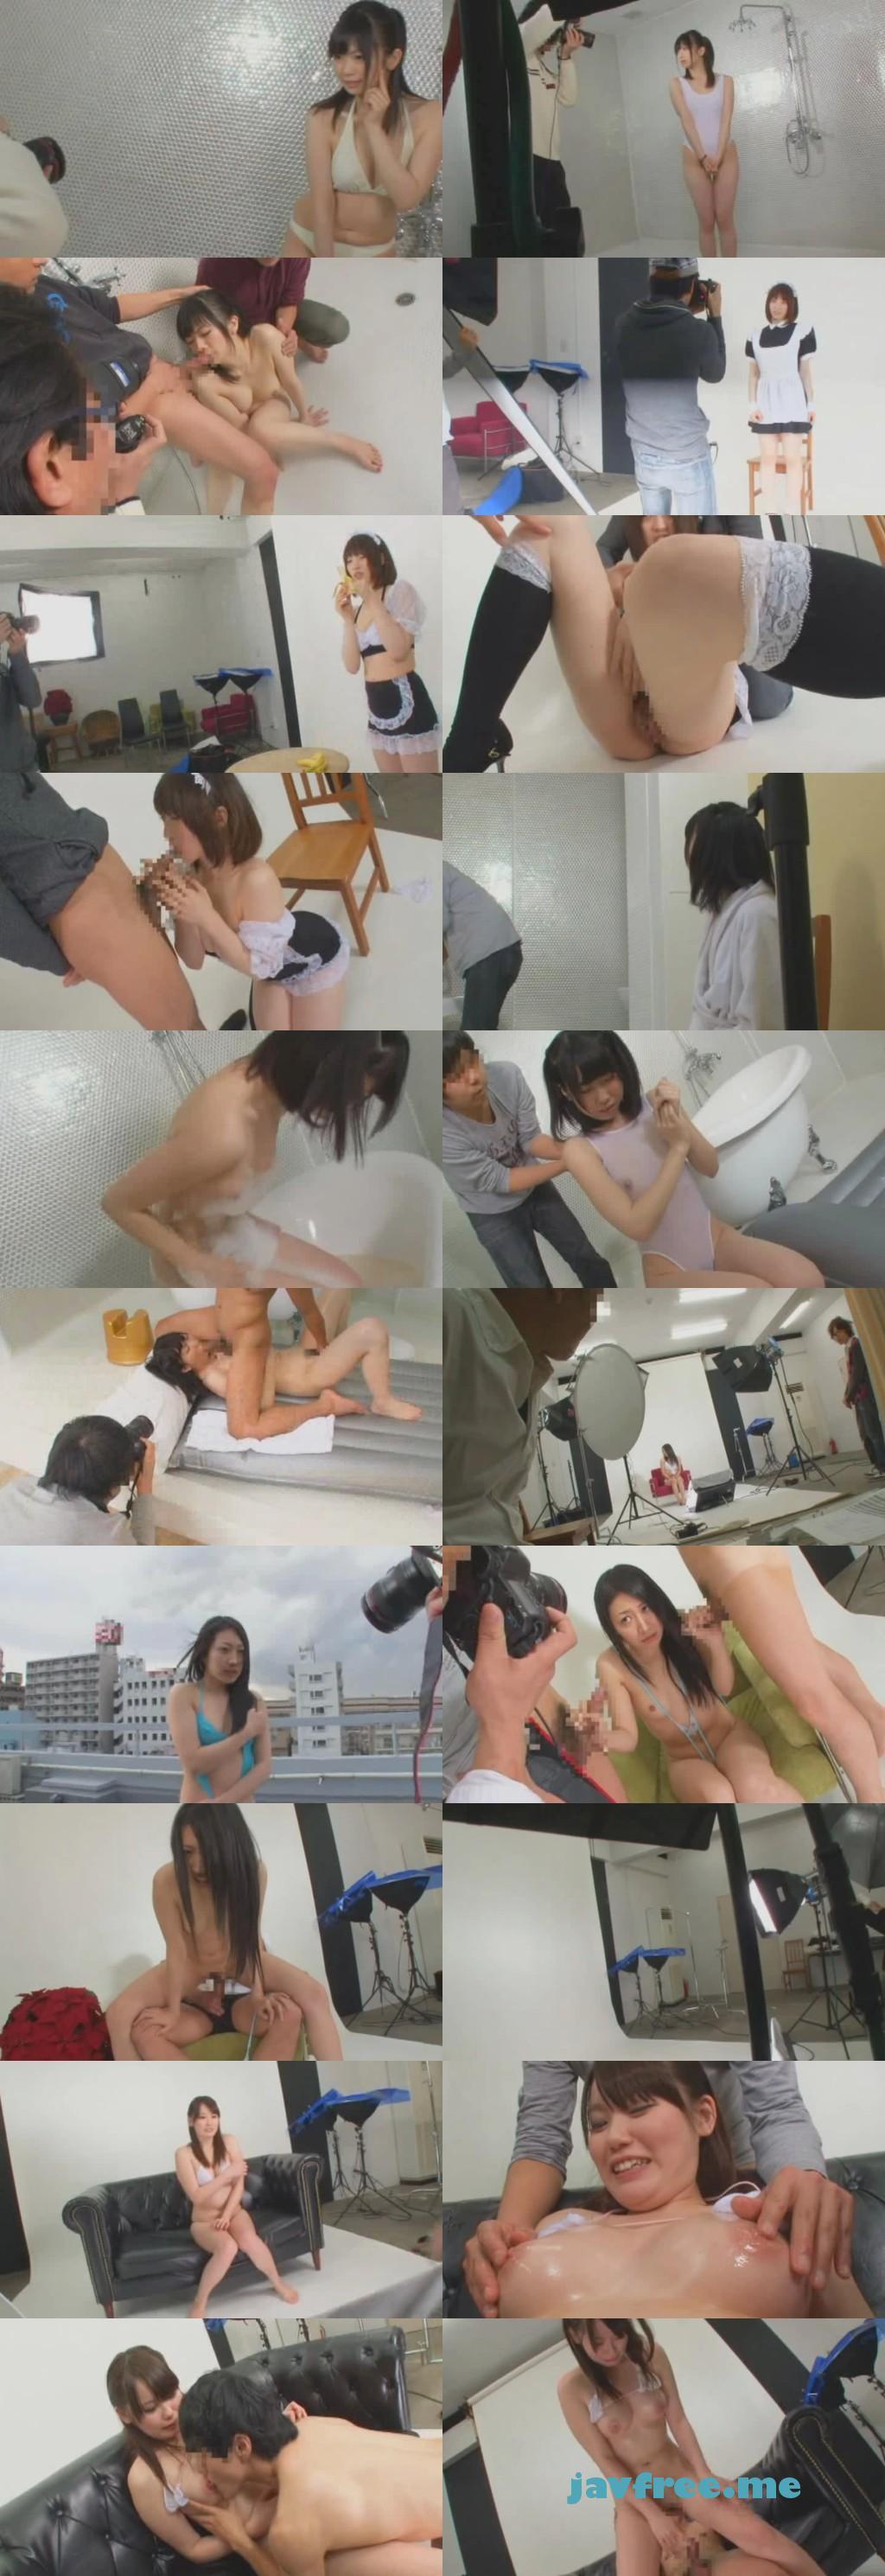 [ATOM-077] 新人アイドル偽グラビア撮影 - image ATOM077 on https://javfree.me